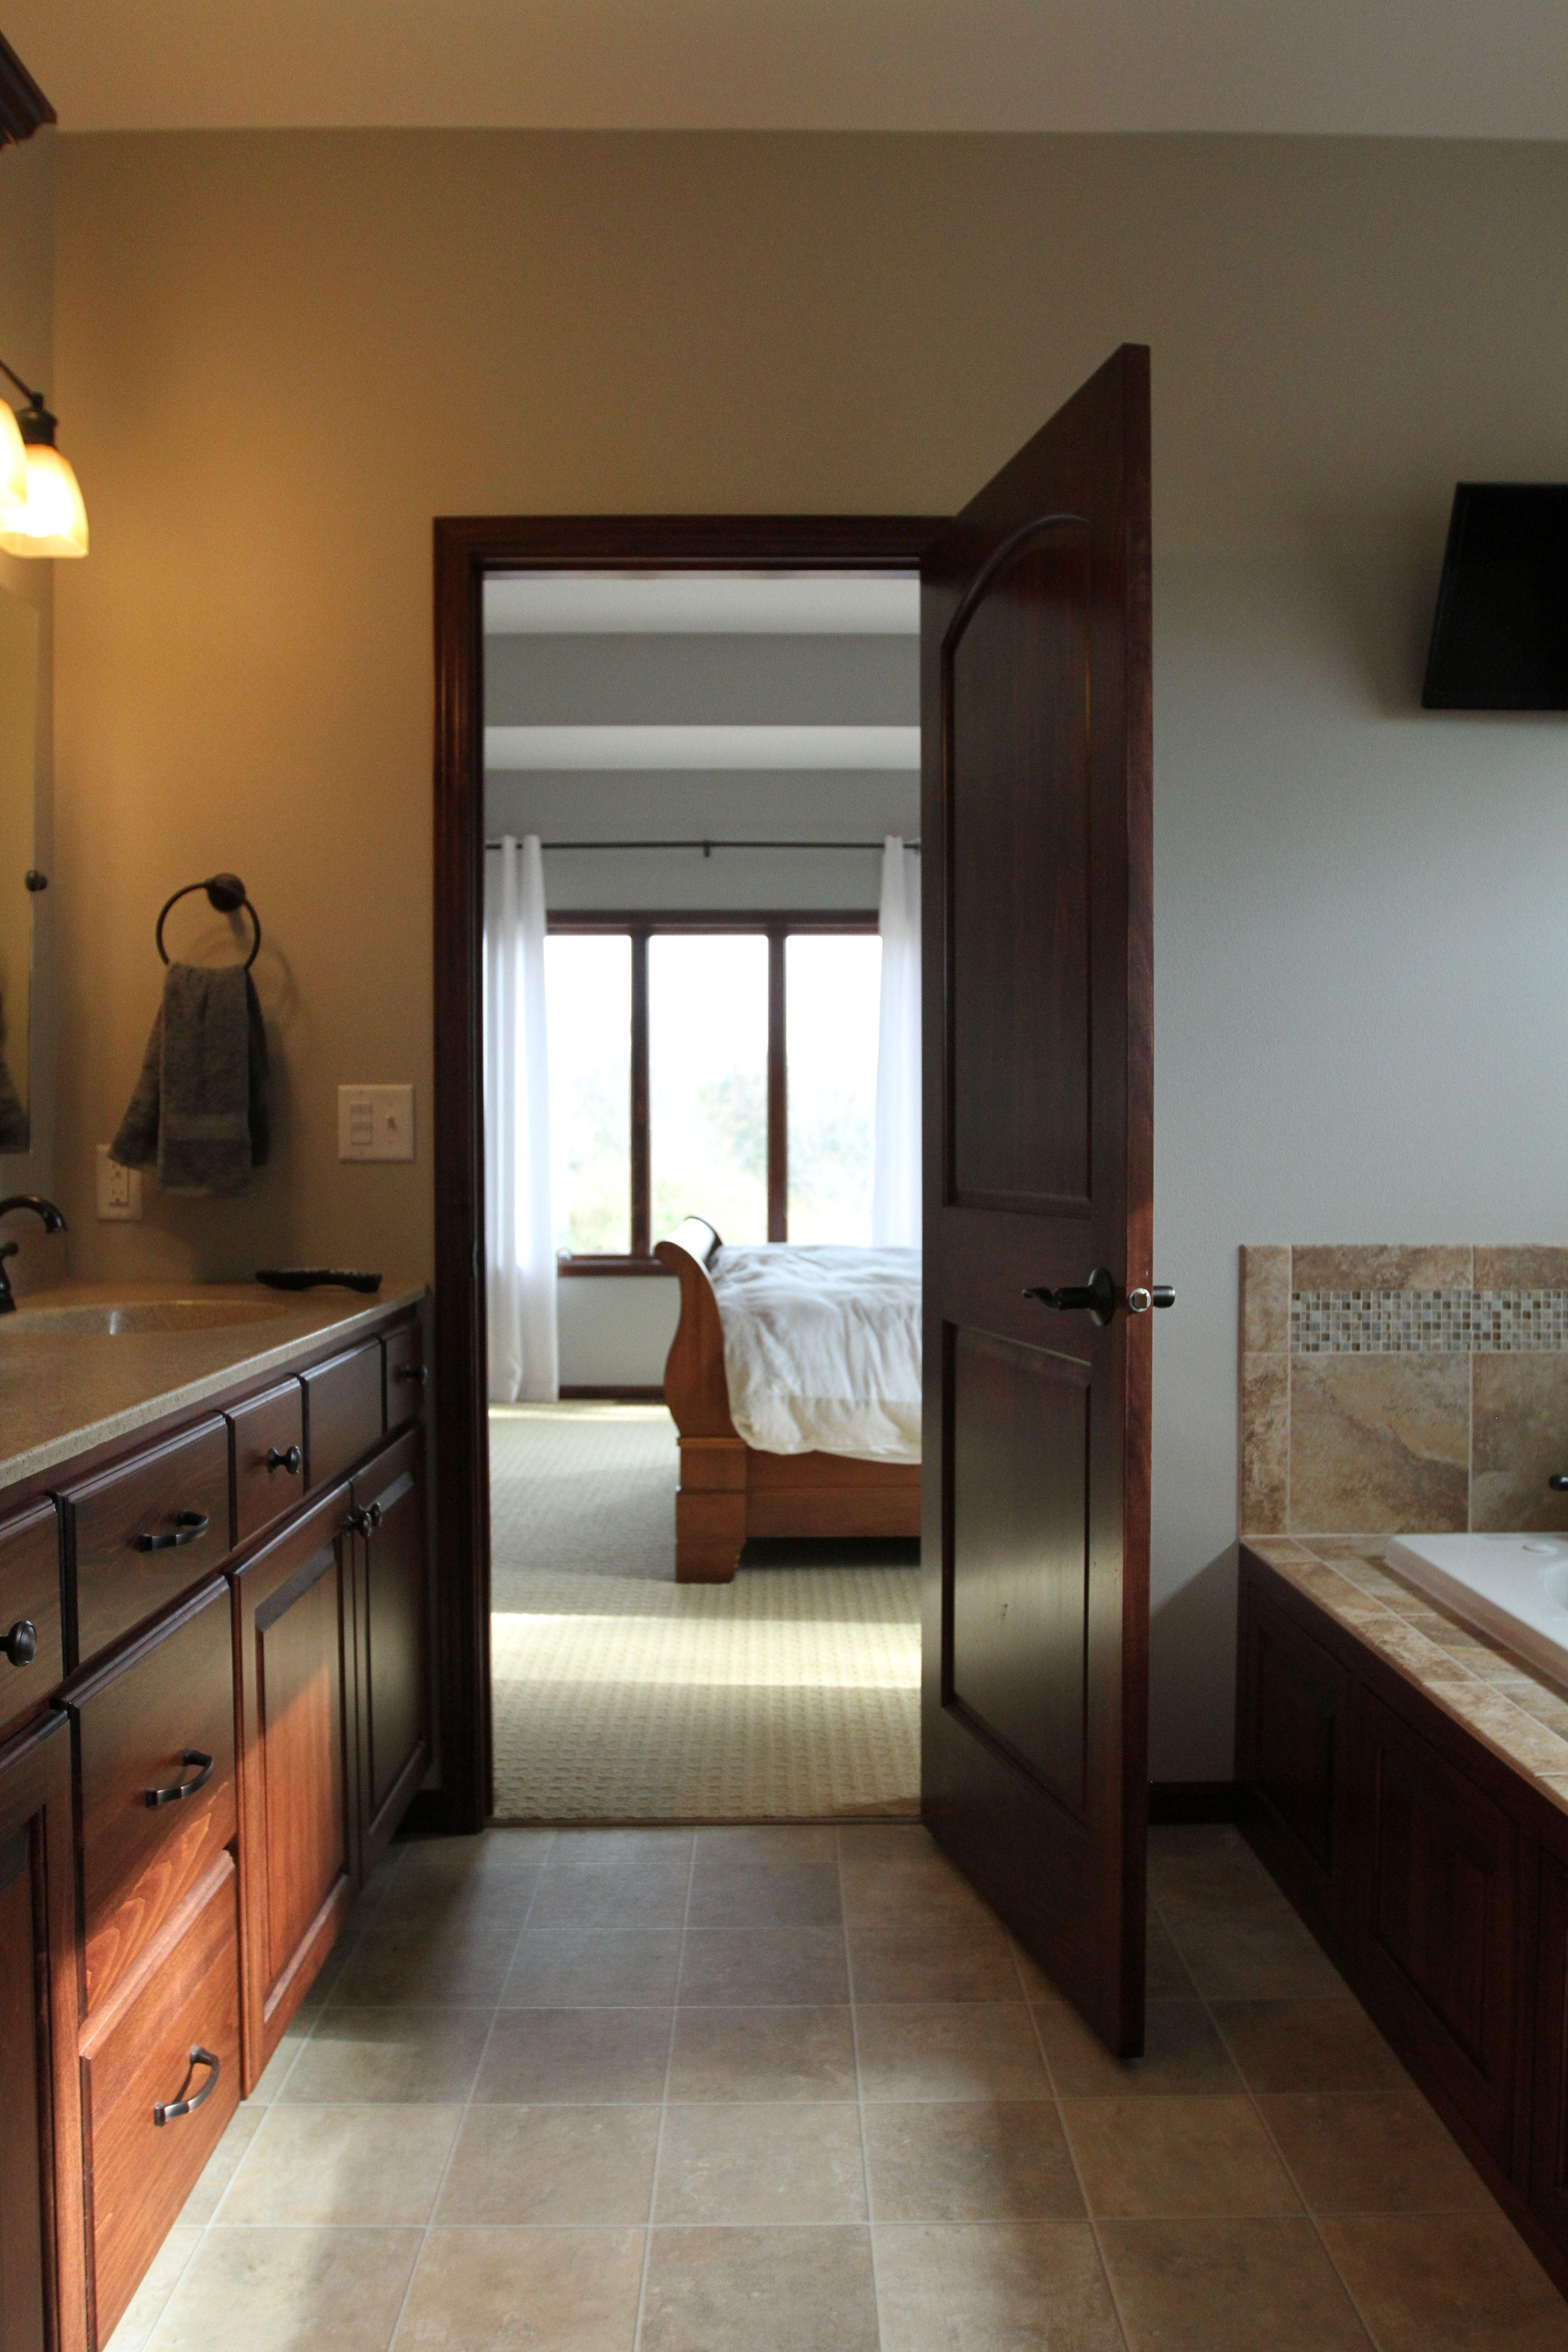 Modern Interior Doors Ideas 30: An Interior Passage Door From Master Bath